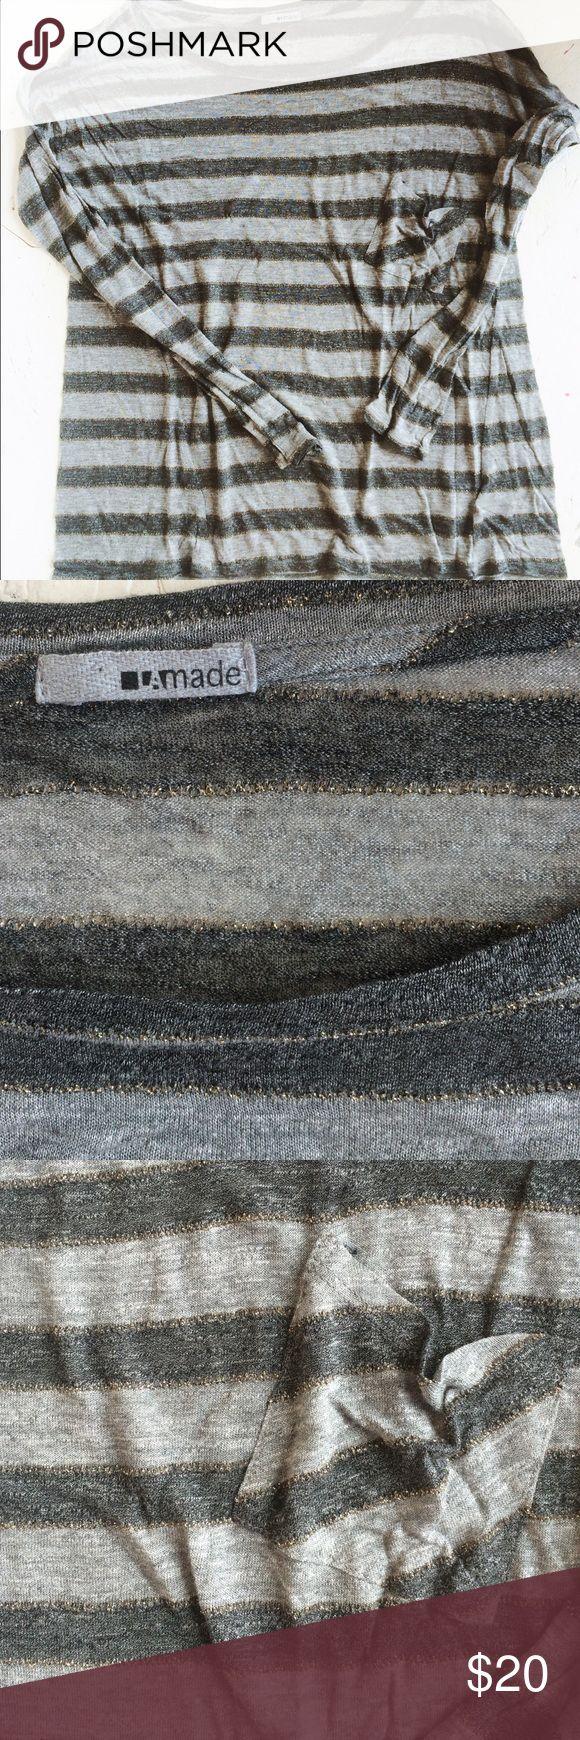 Lamade stripe metallic tee Super soft stripe long sleeve tee win metallic LAmade Tops Tees - Long Sleeve